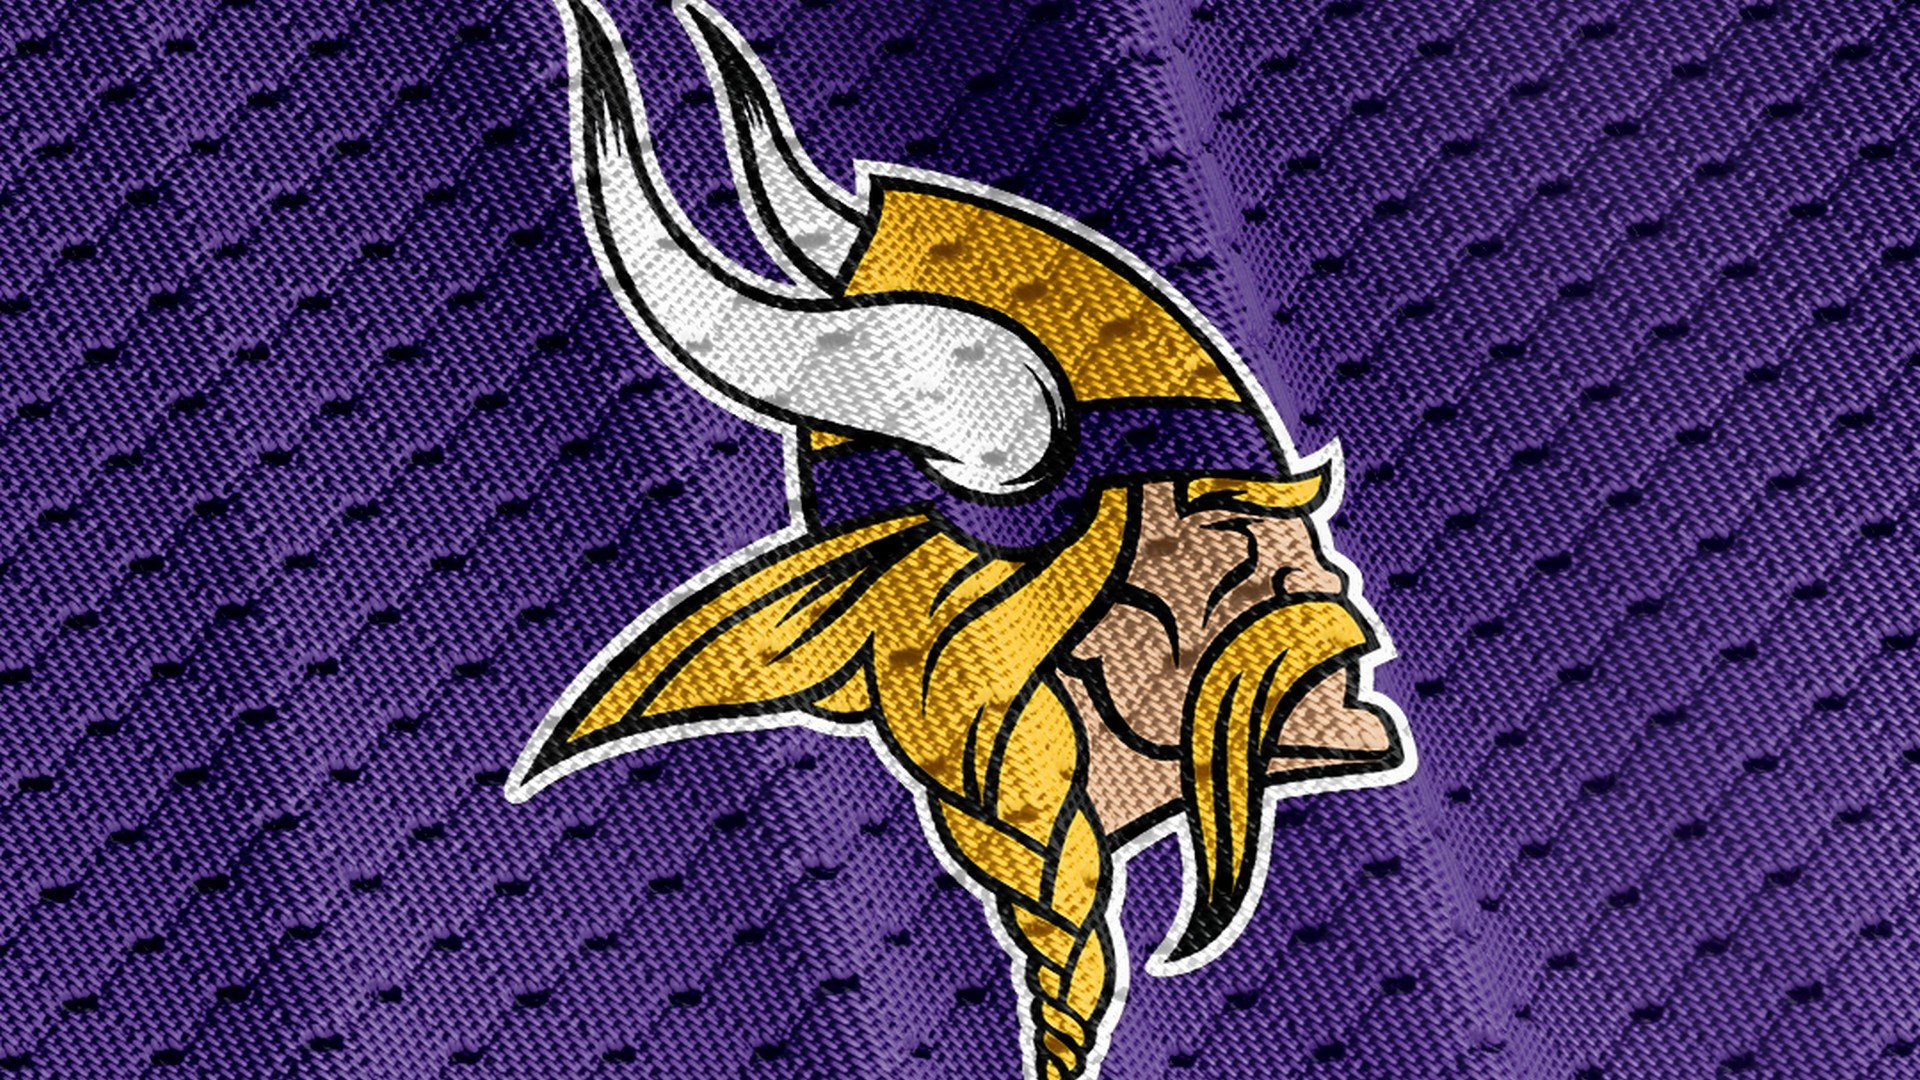 Minnesota Vikings For PC Wallpaper 2019 NFL Football Wallpapers 1920x1080